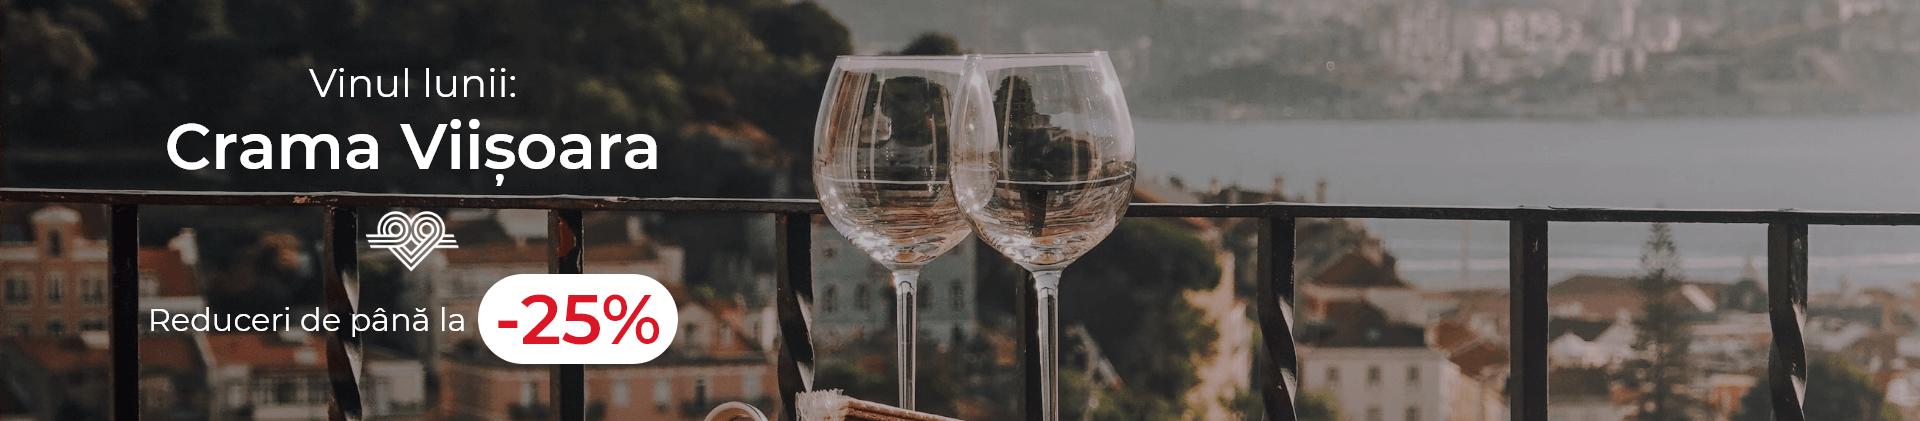 crama vin viisoara